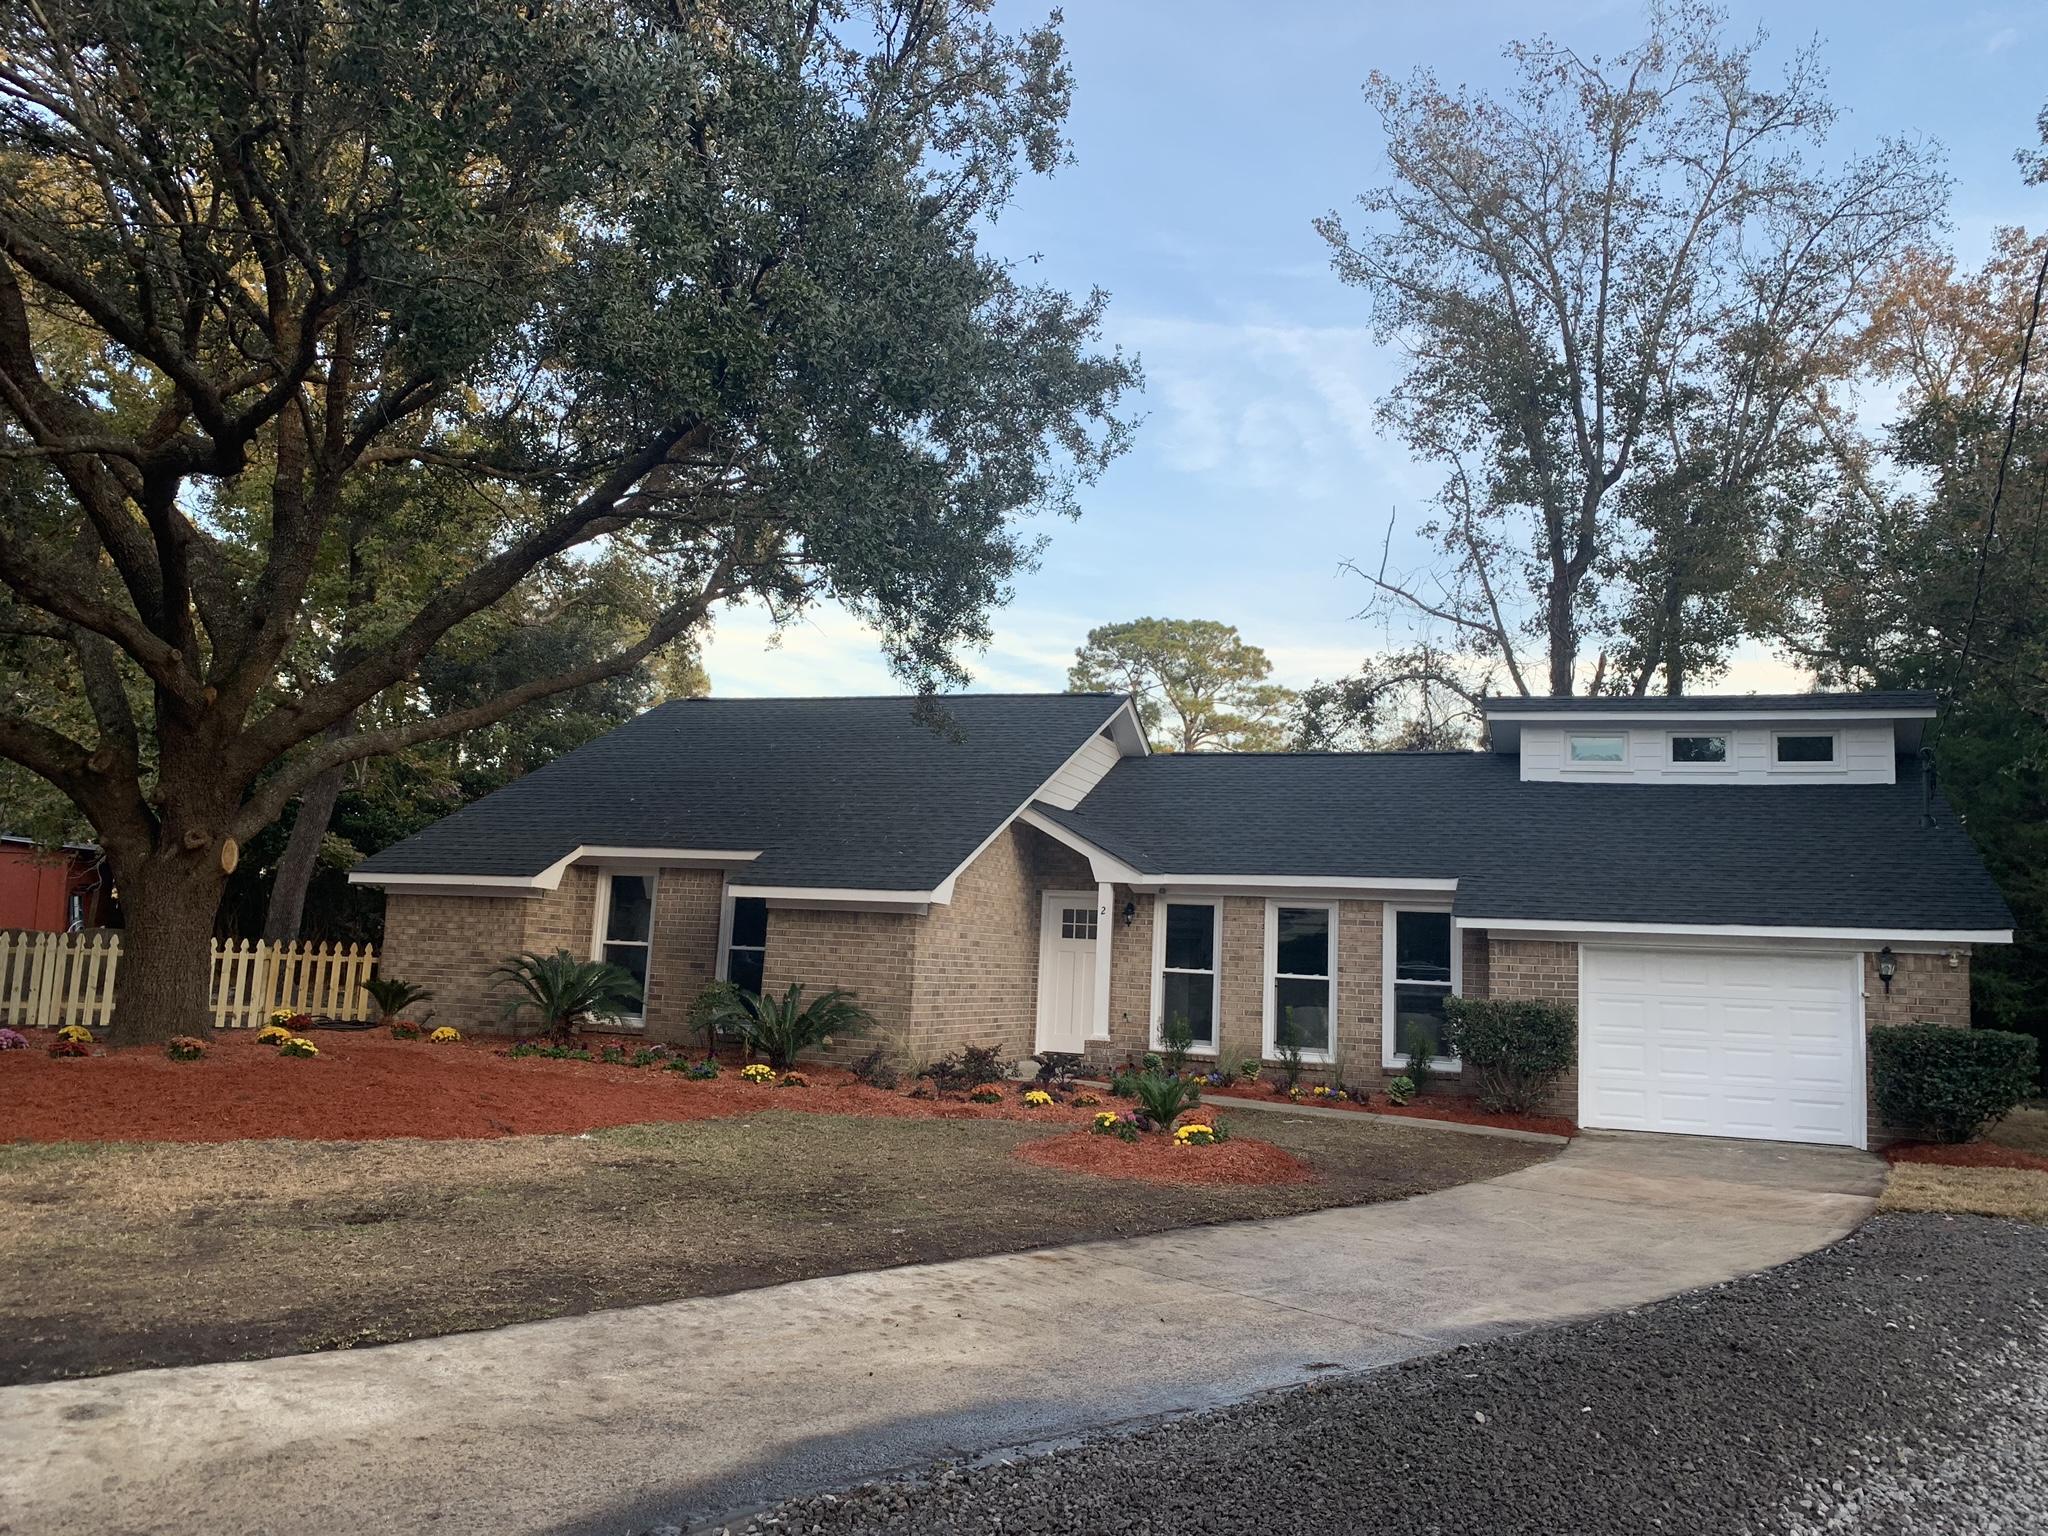 Heathwood Ext Homes For Sale - 2 Blaine, Charleston, SC - 8